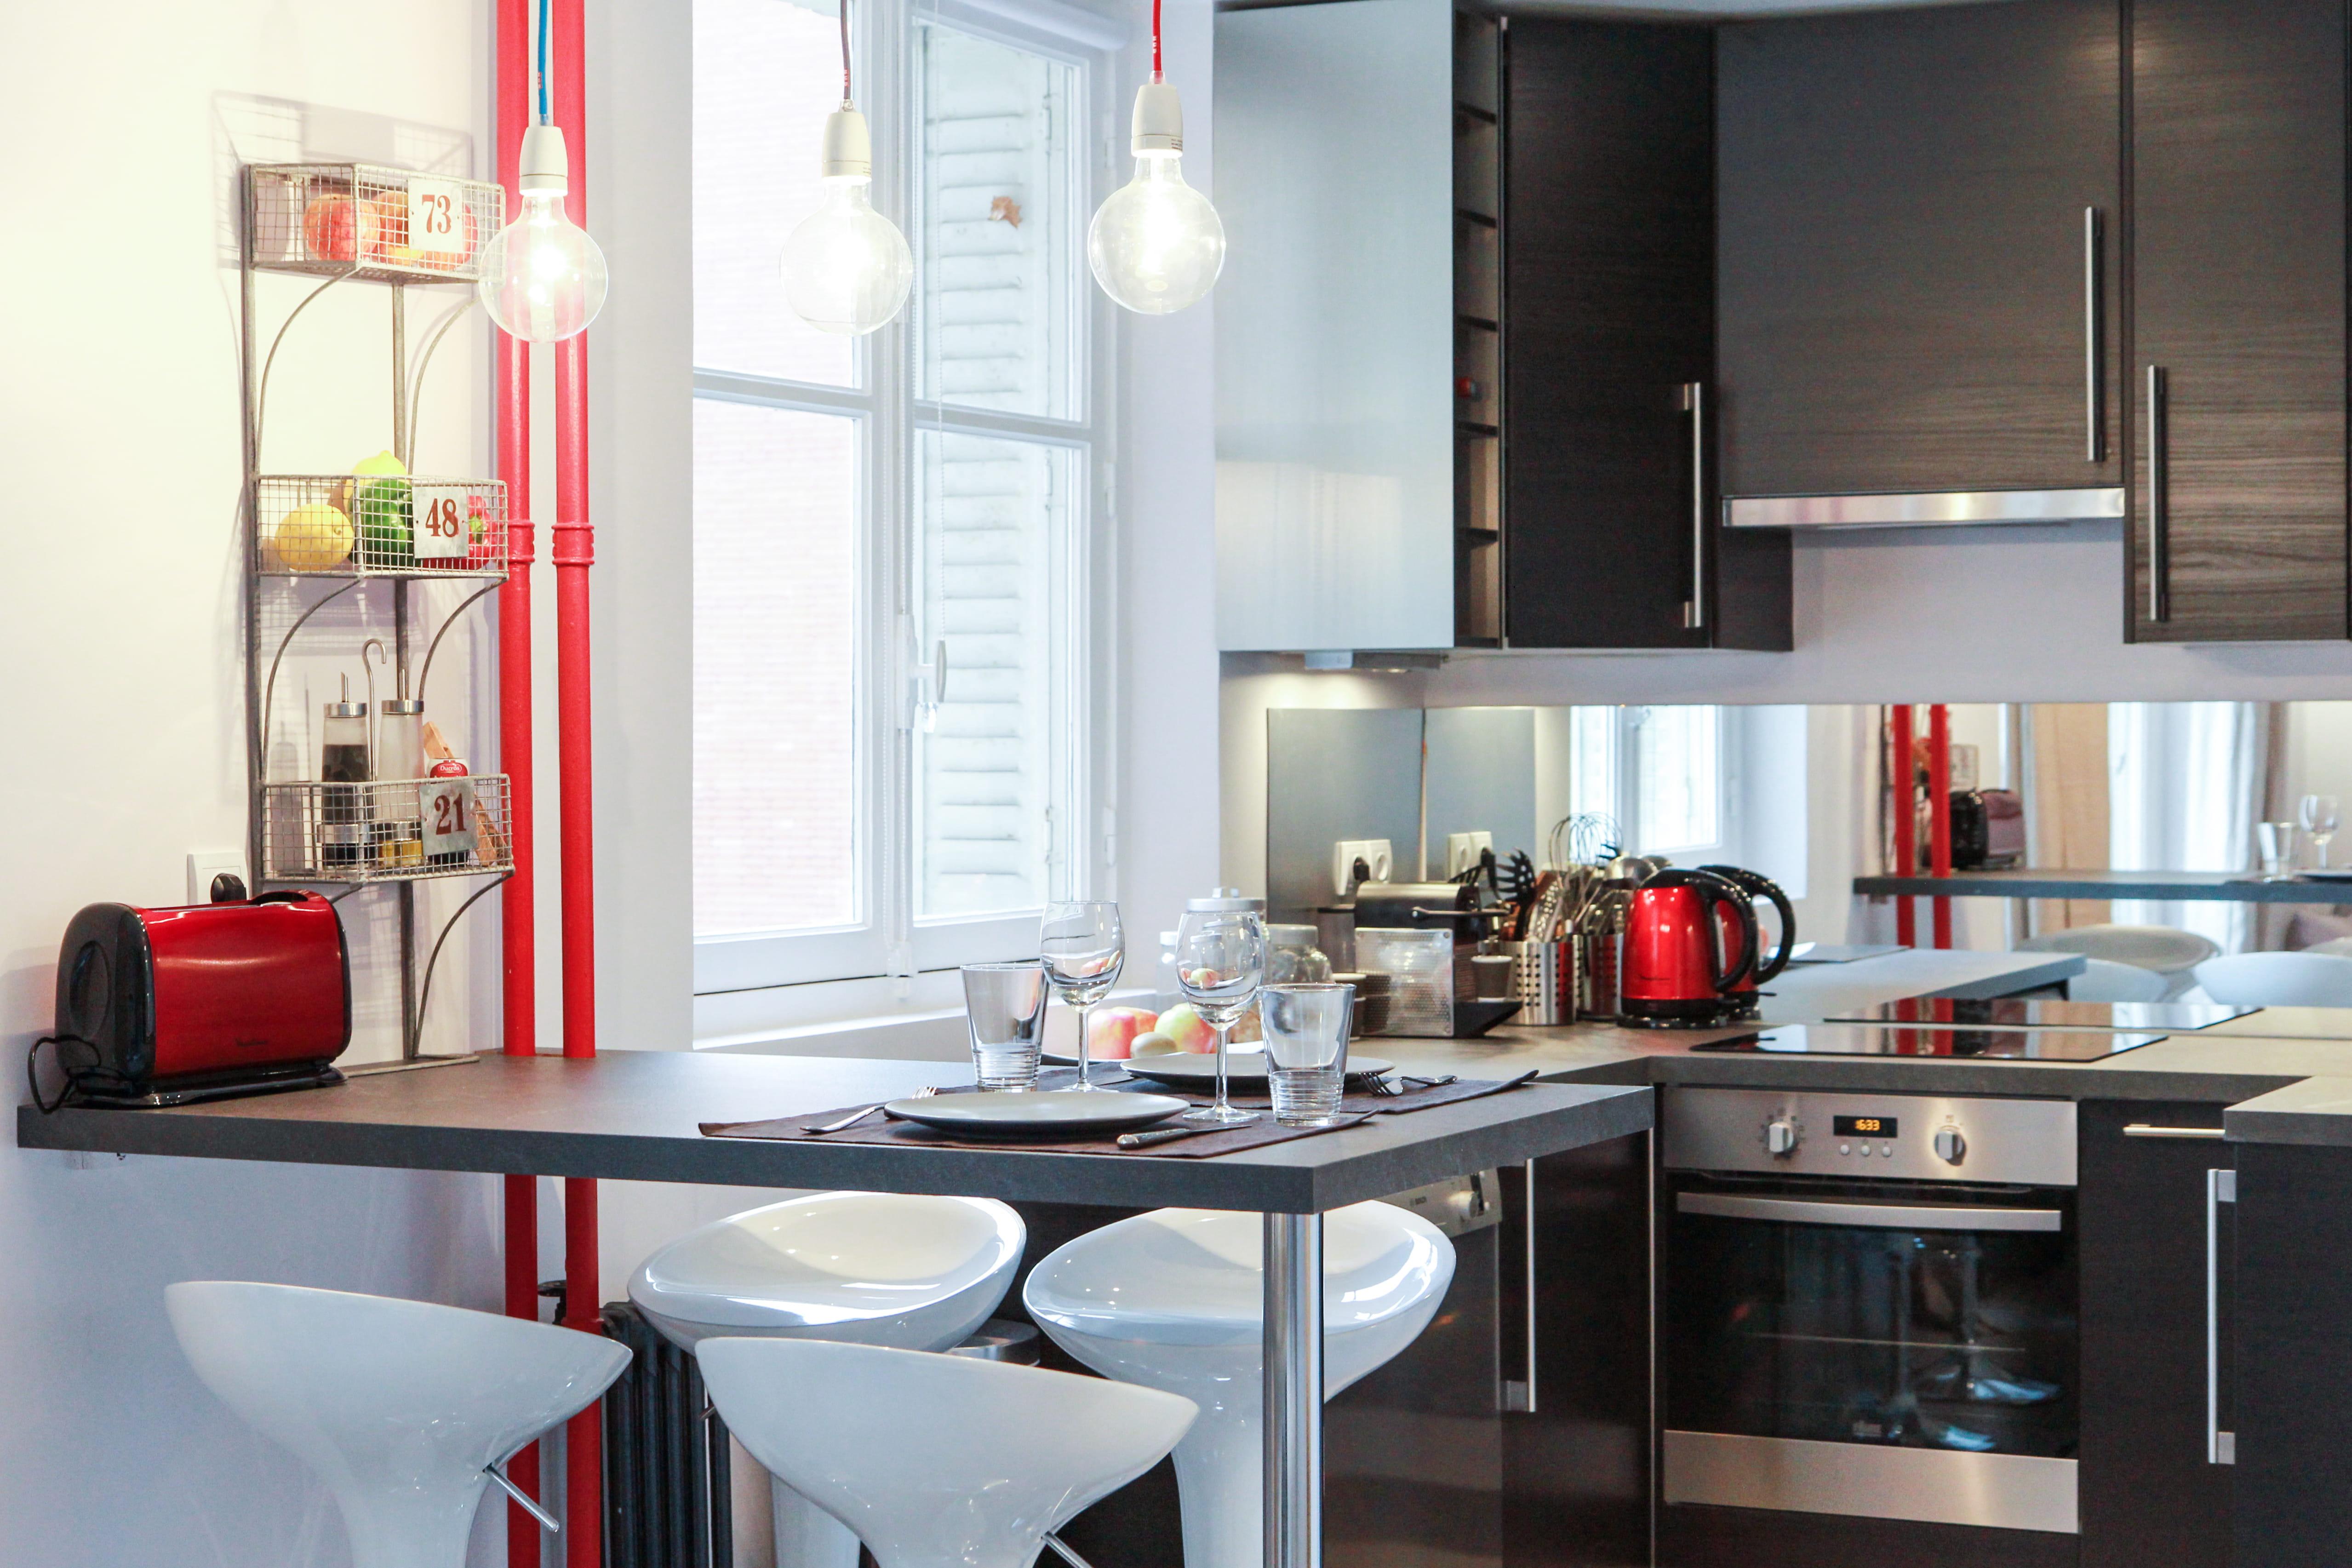 18 id es pour une petite cuisine optimis e et fonctionnelle - Cuisine fonctionnelle petit espace ...